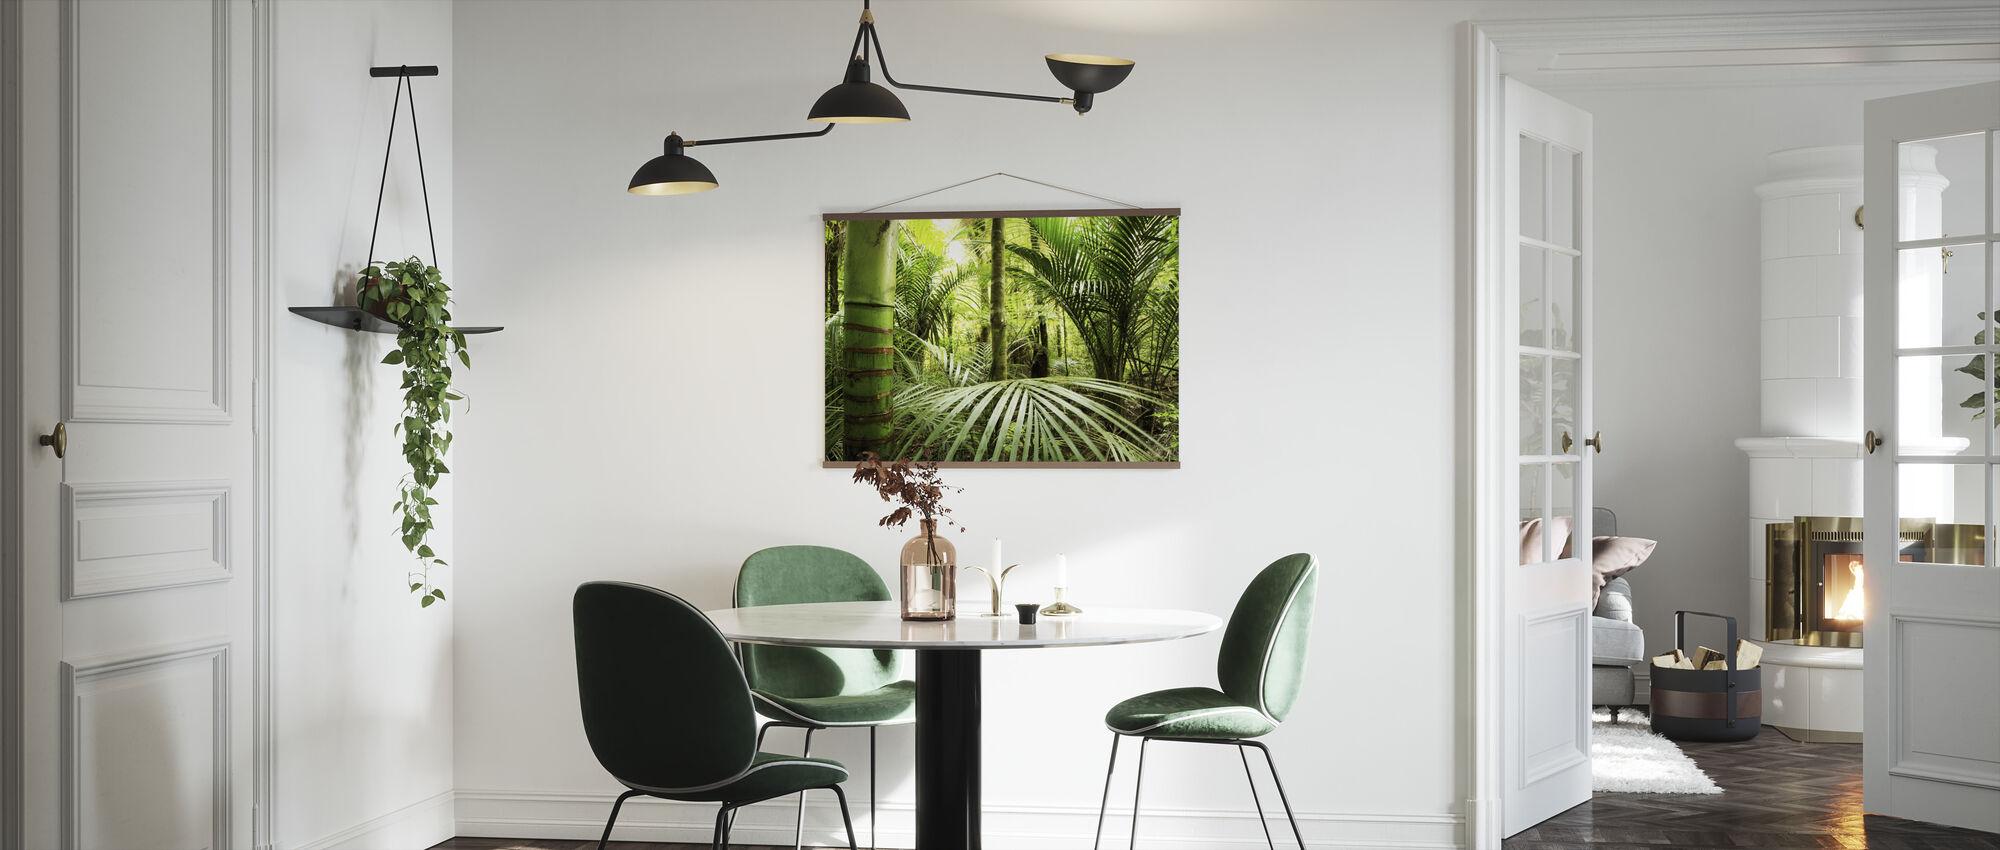 Vegetation - Poster - Küchen